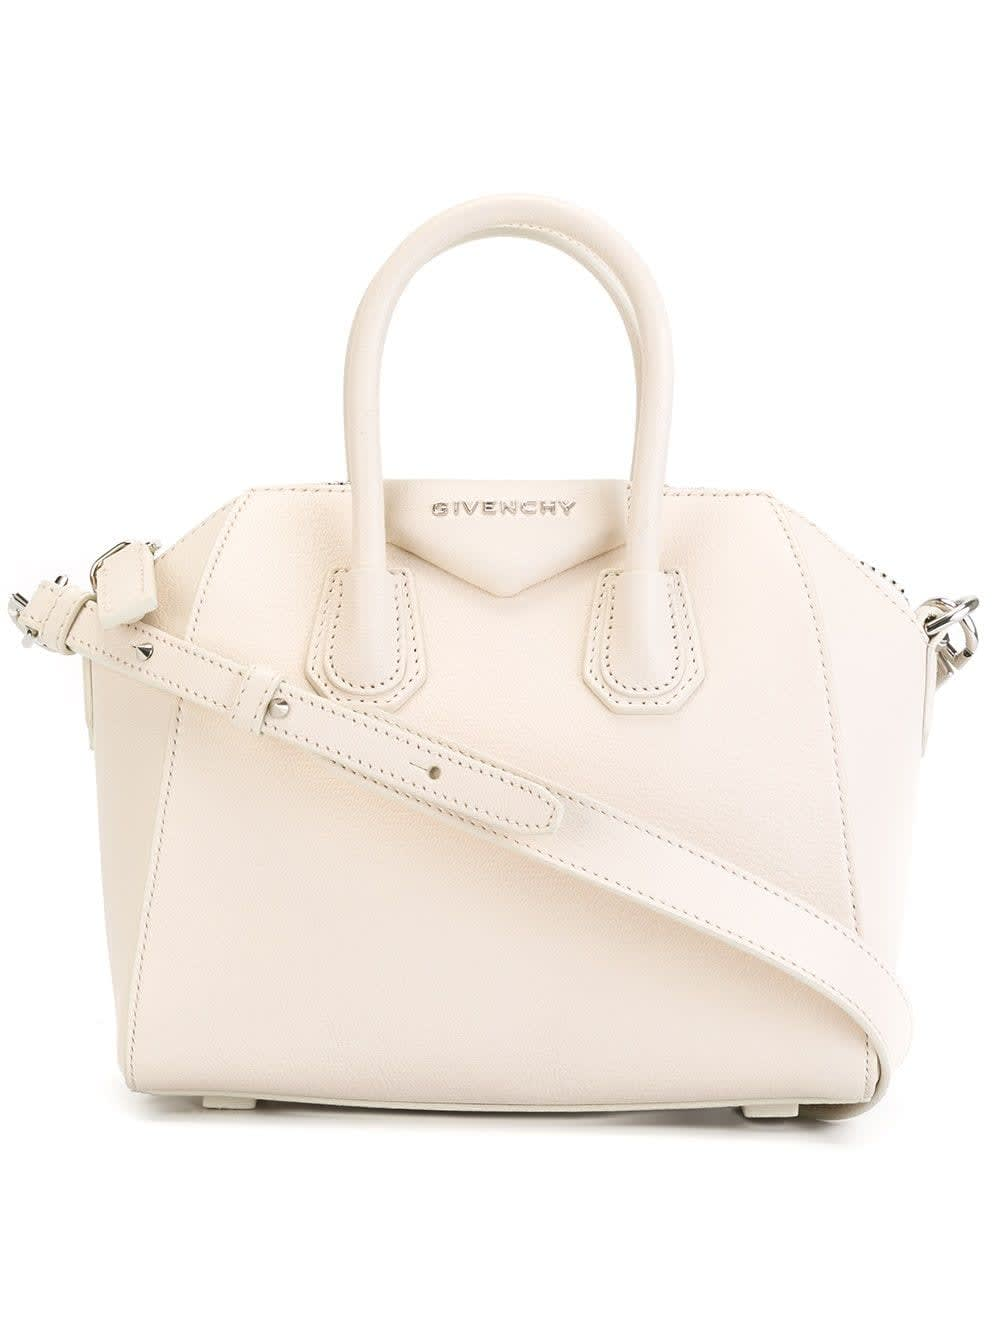 Mini Antigona Bag In Light Pink Grain Leather